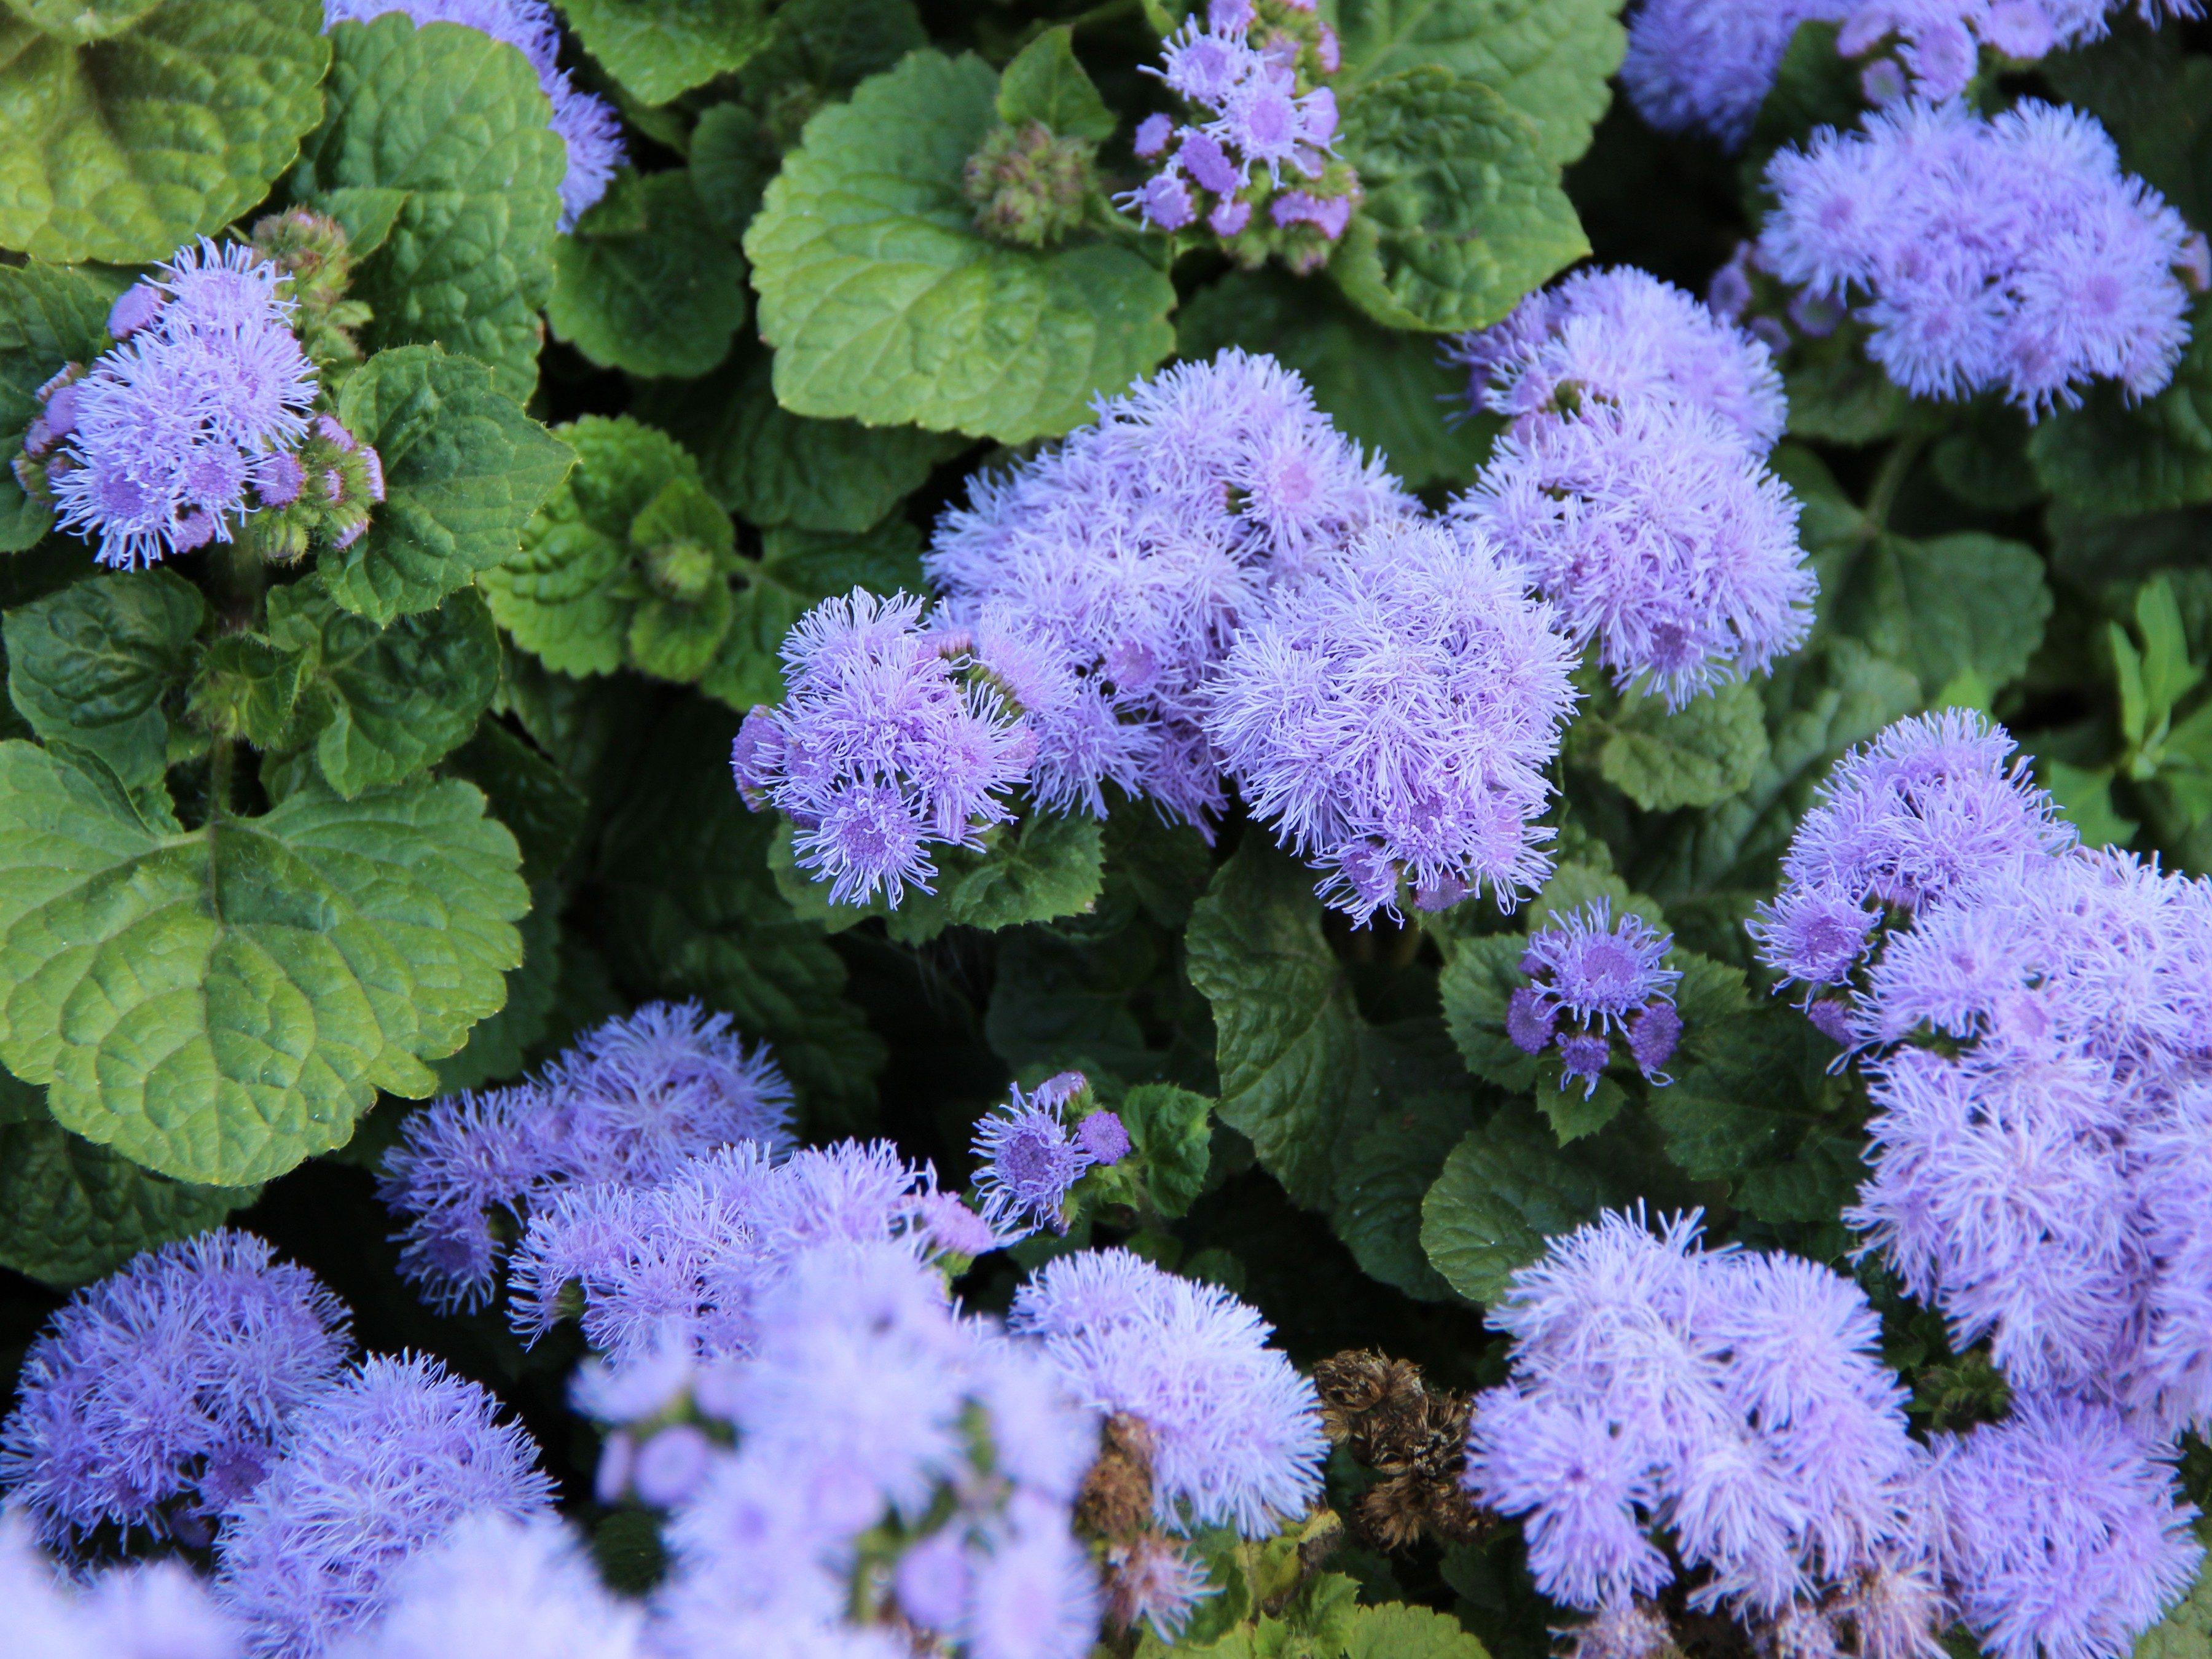 8 annuals that are perfect for container gardening 5 ageratum izmirmasajfo